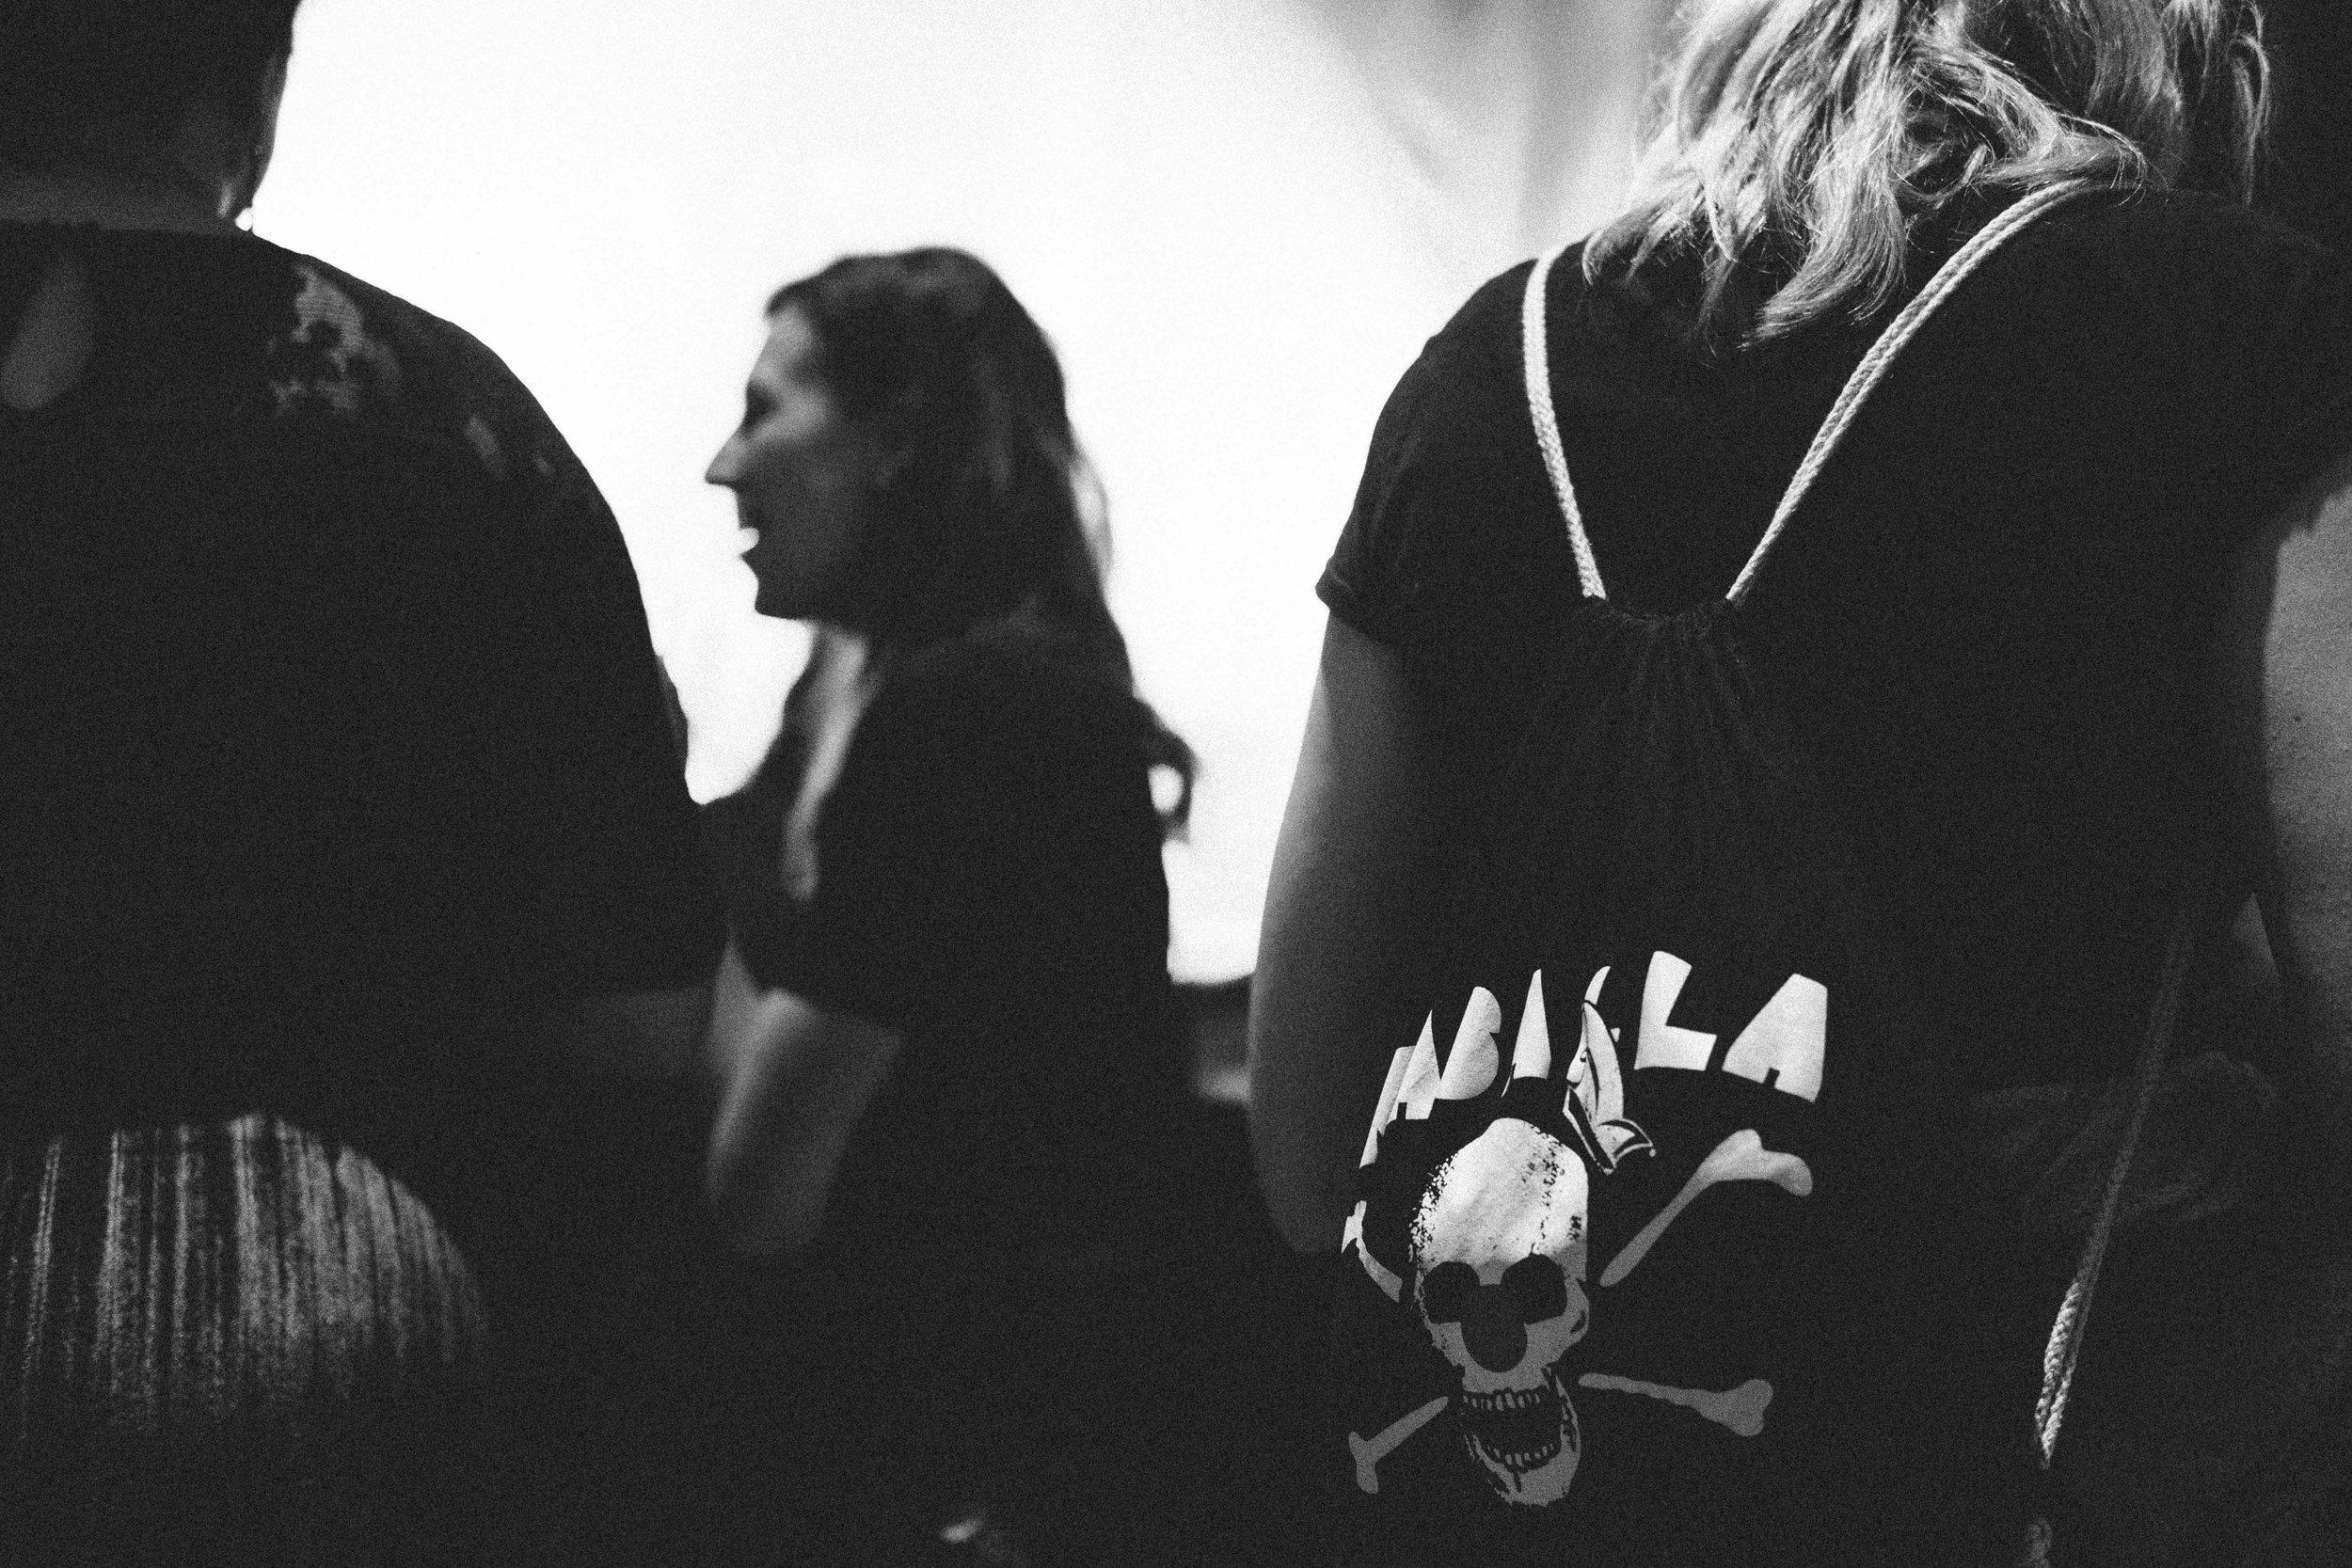 grooves-united-festival-2016-wearecity-atheneadiapoulis-28.jpg